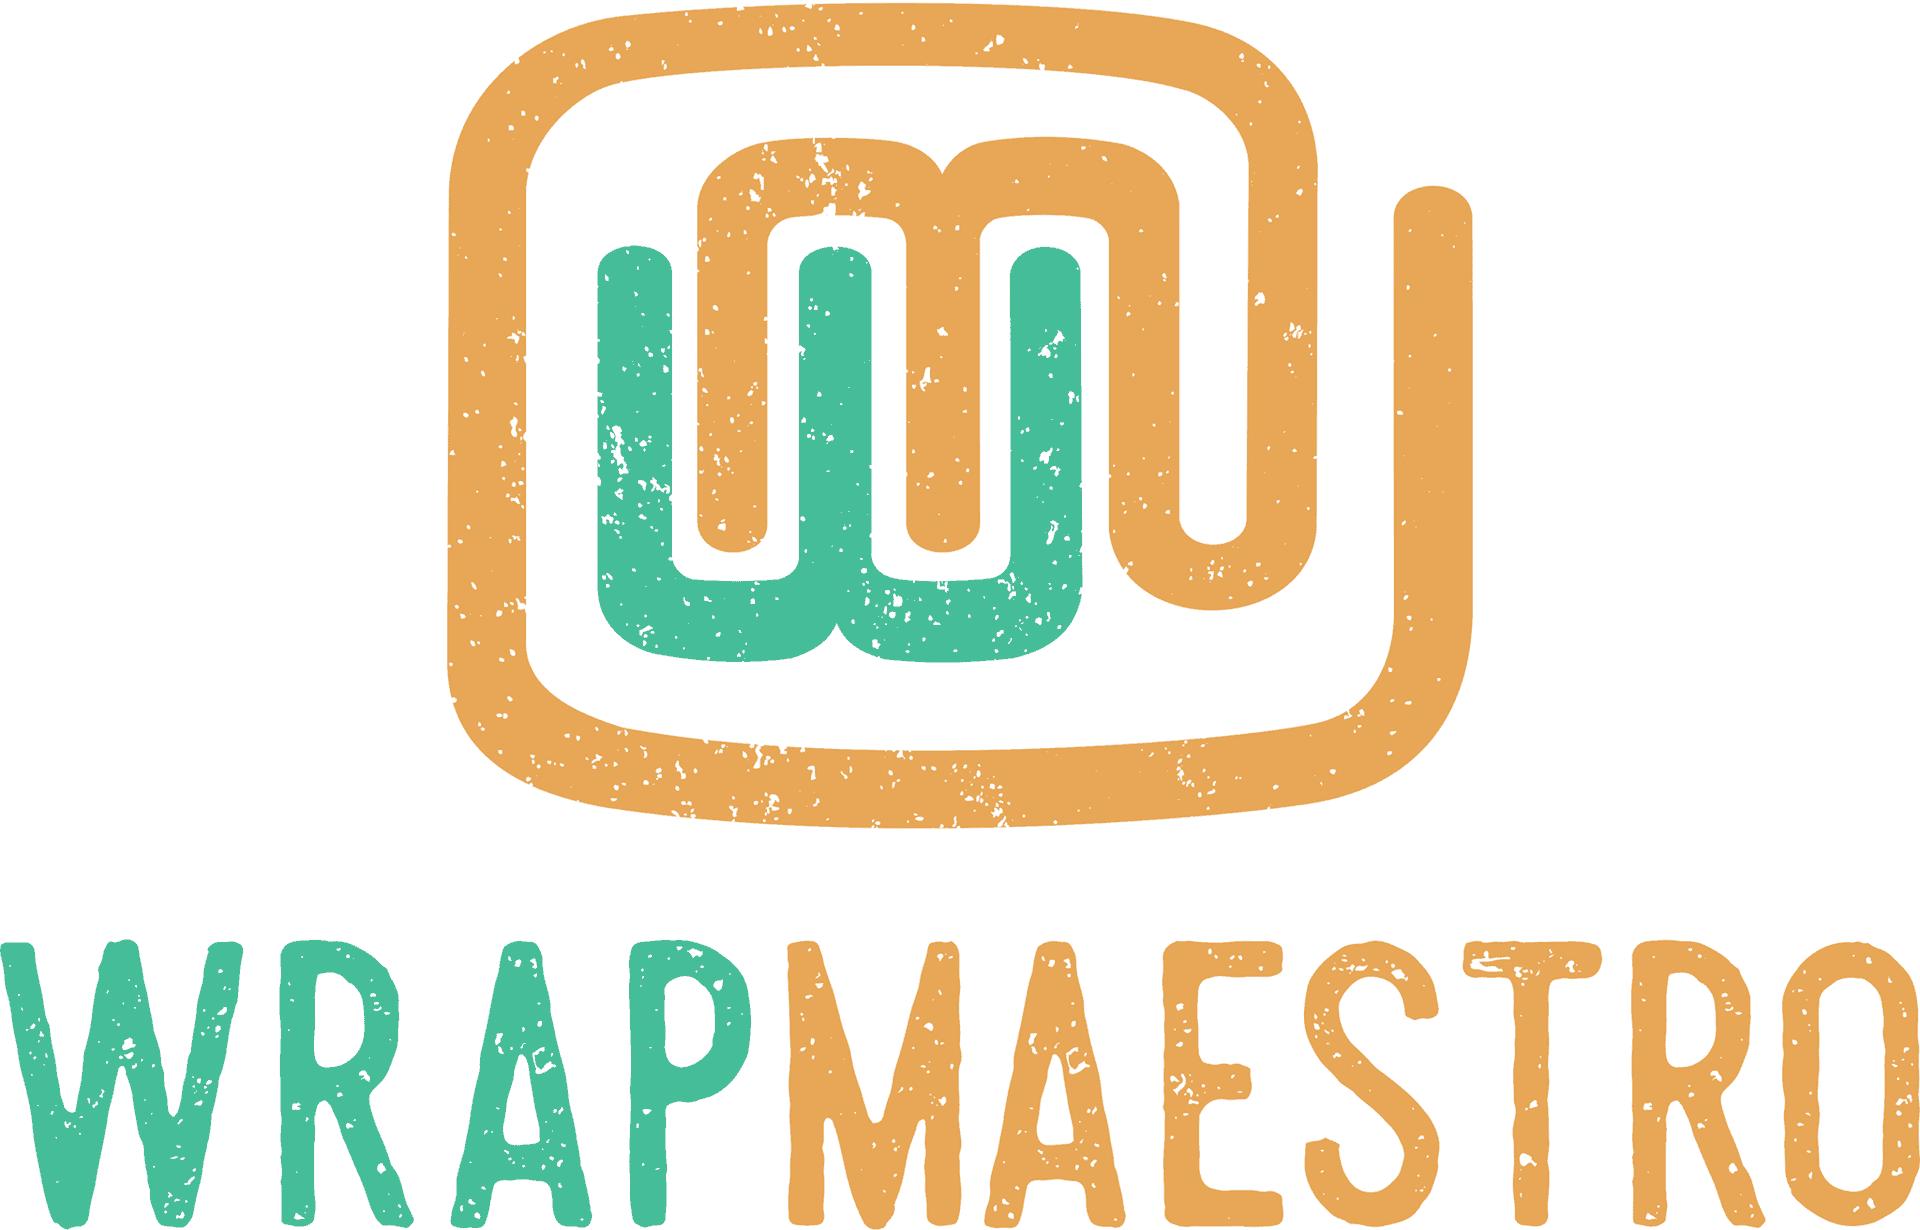 Wrap Maestro